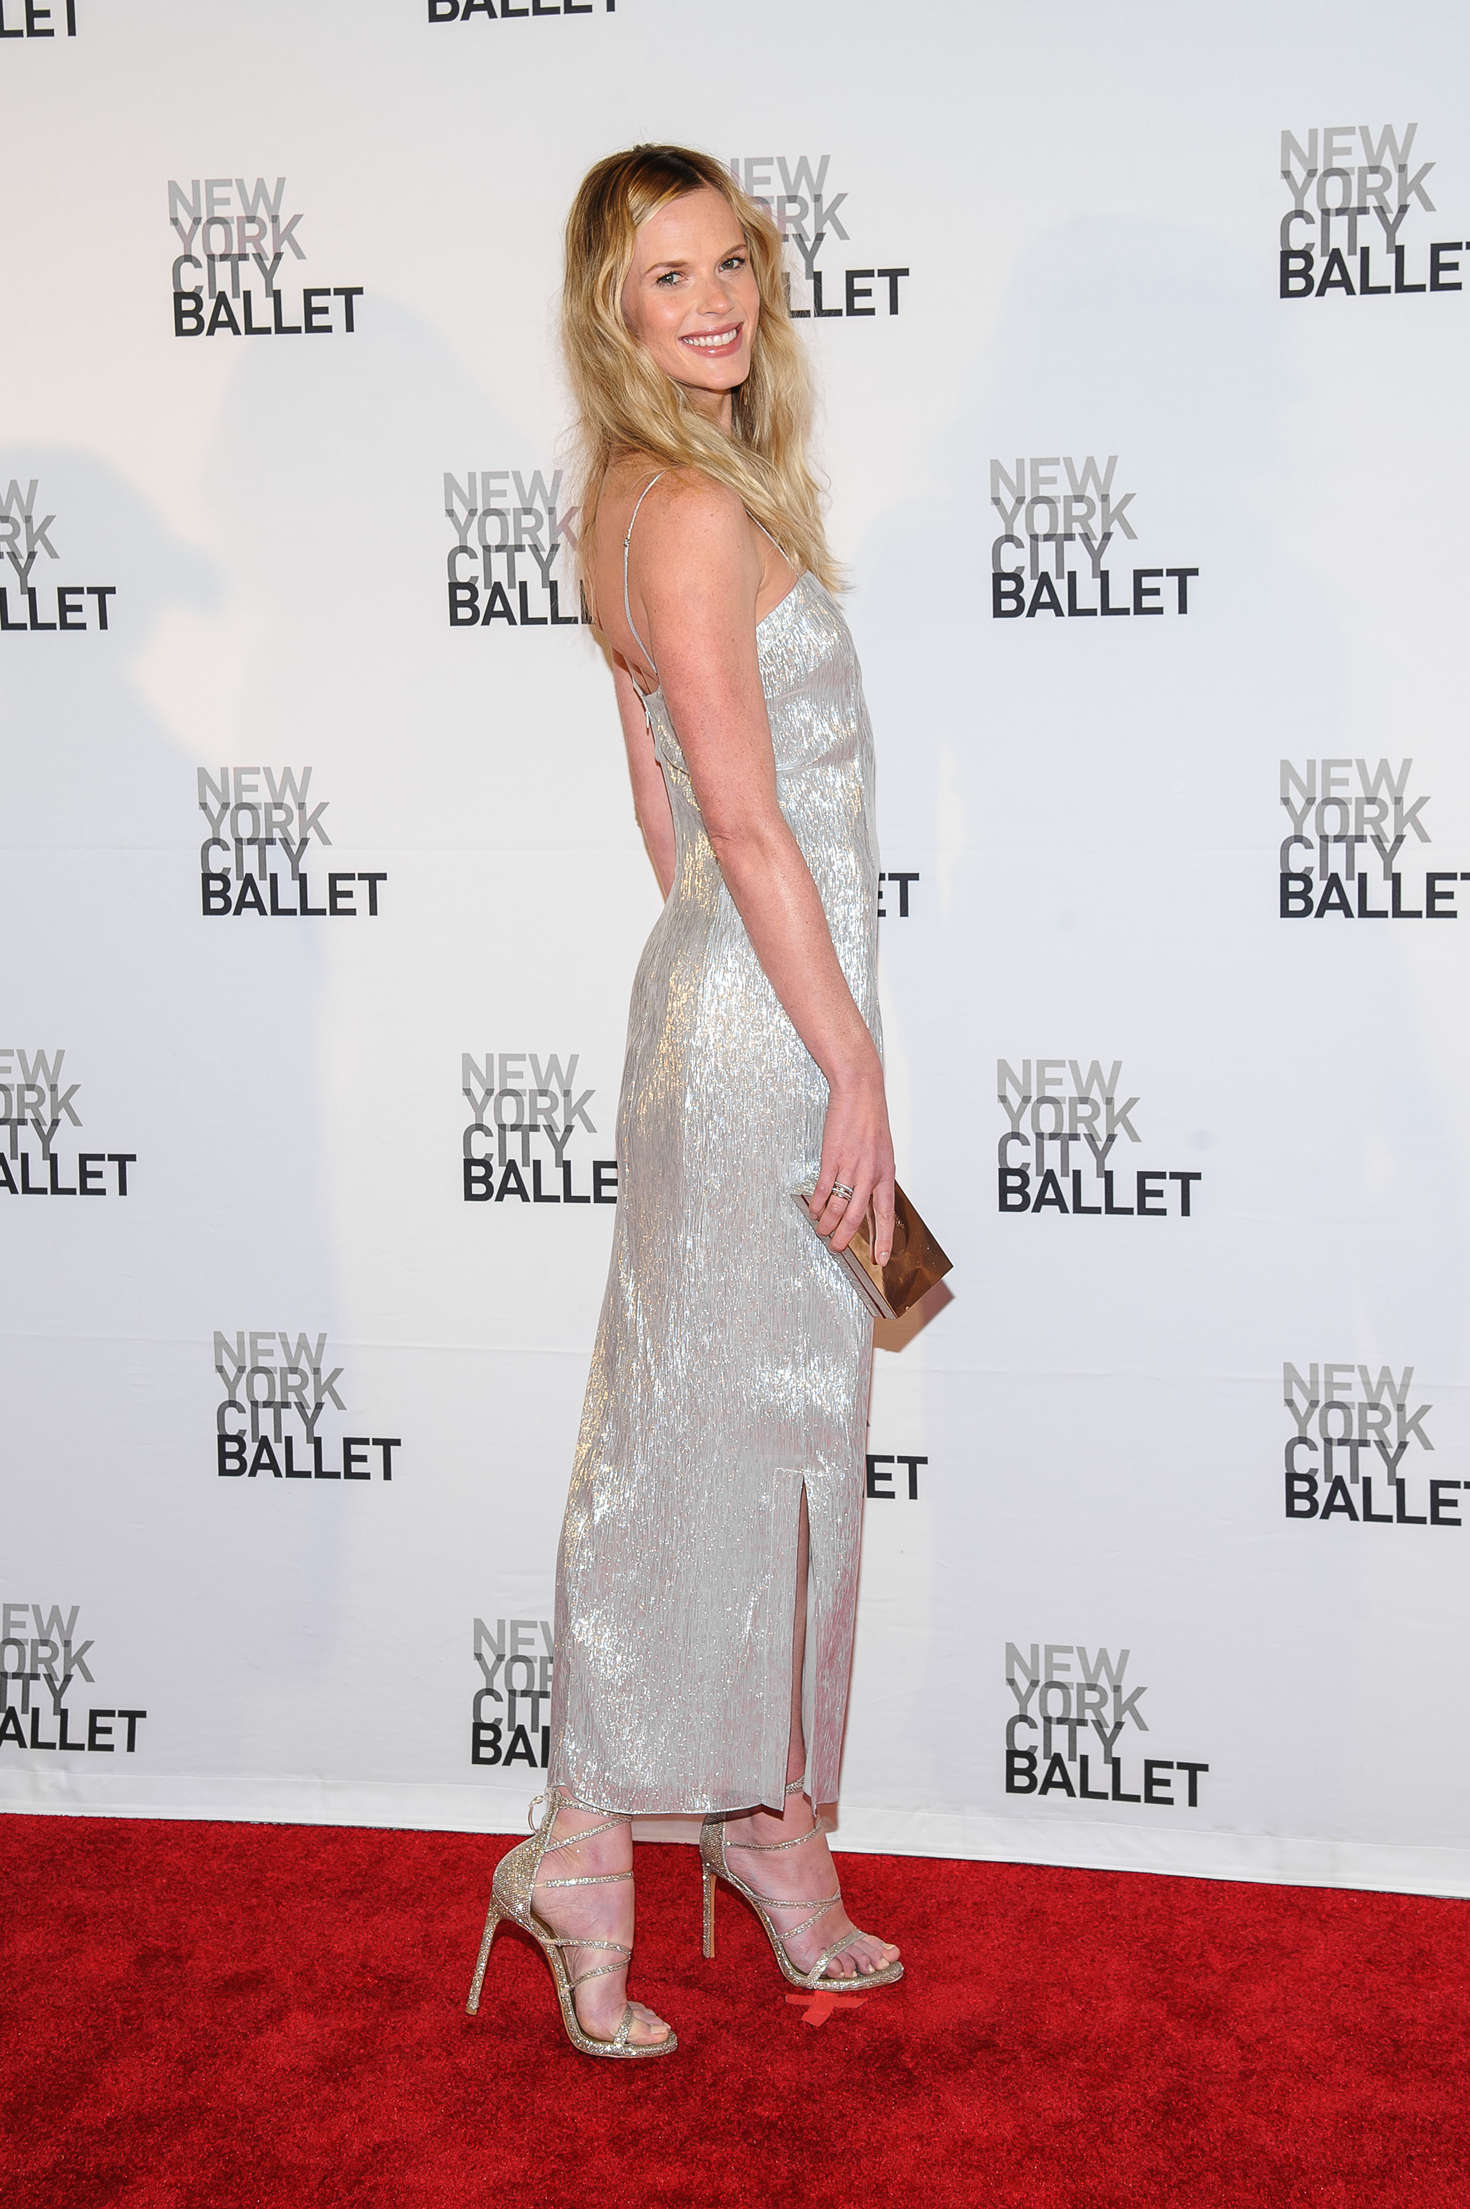 Anne Vyalitsyna New York City Ballet Spring Gala in New York